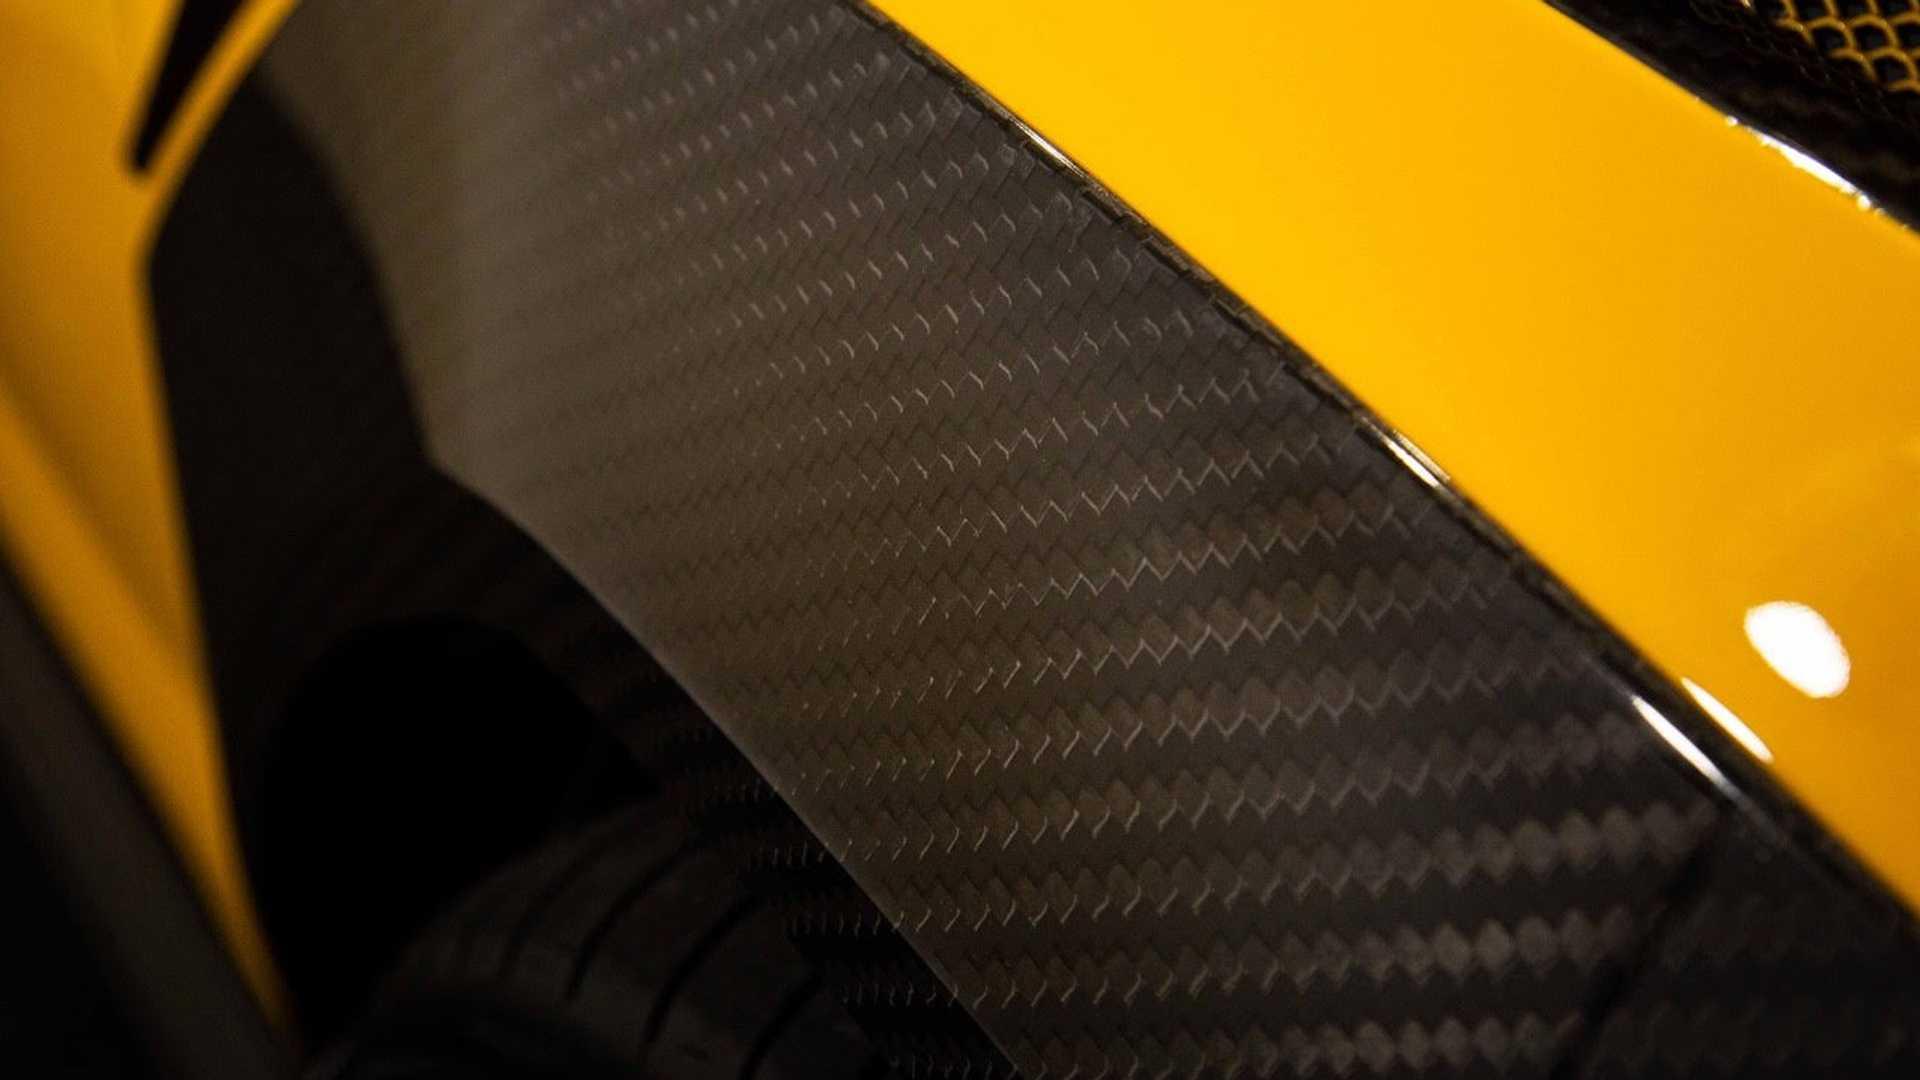 Lamborghini-Urus-by-Keyvany-13